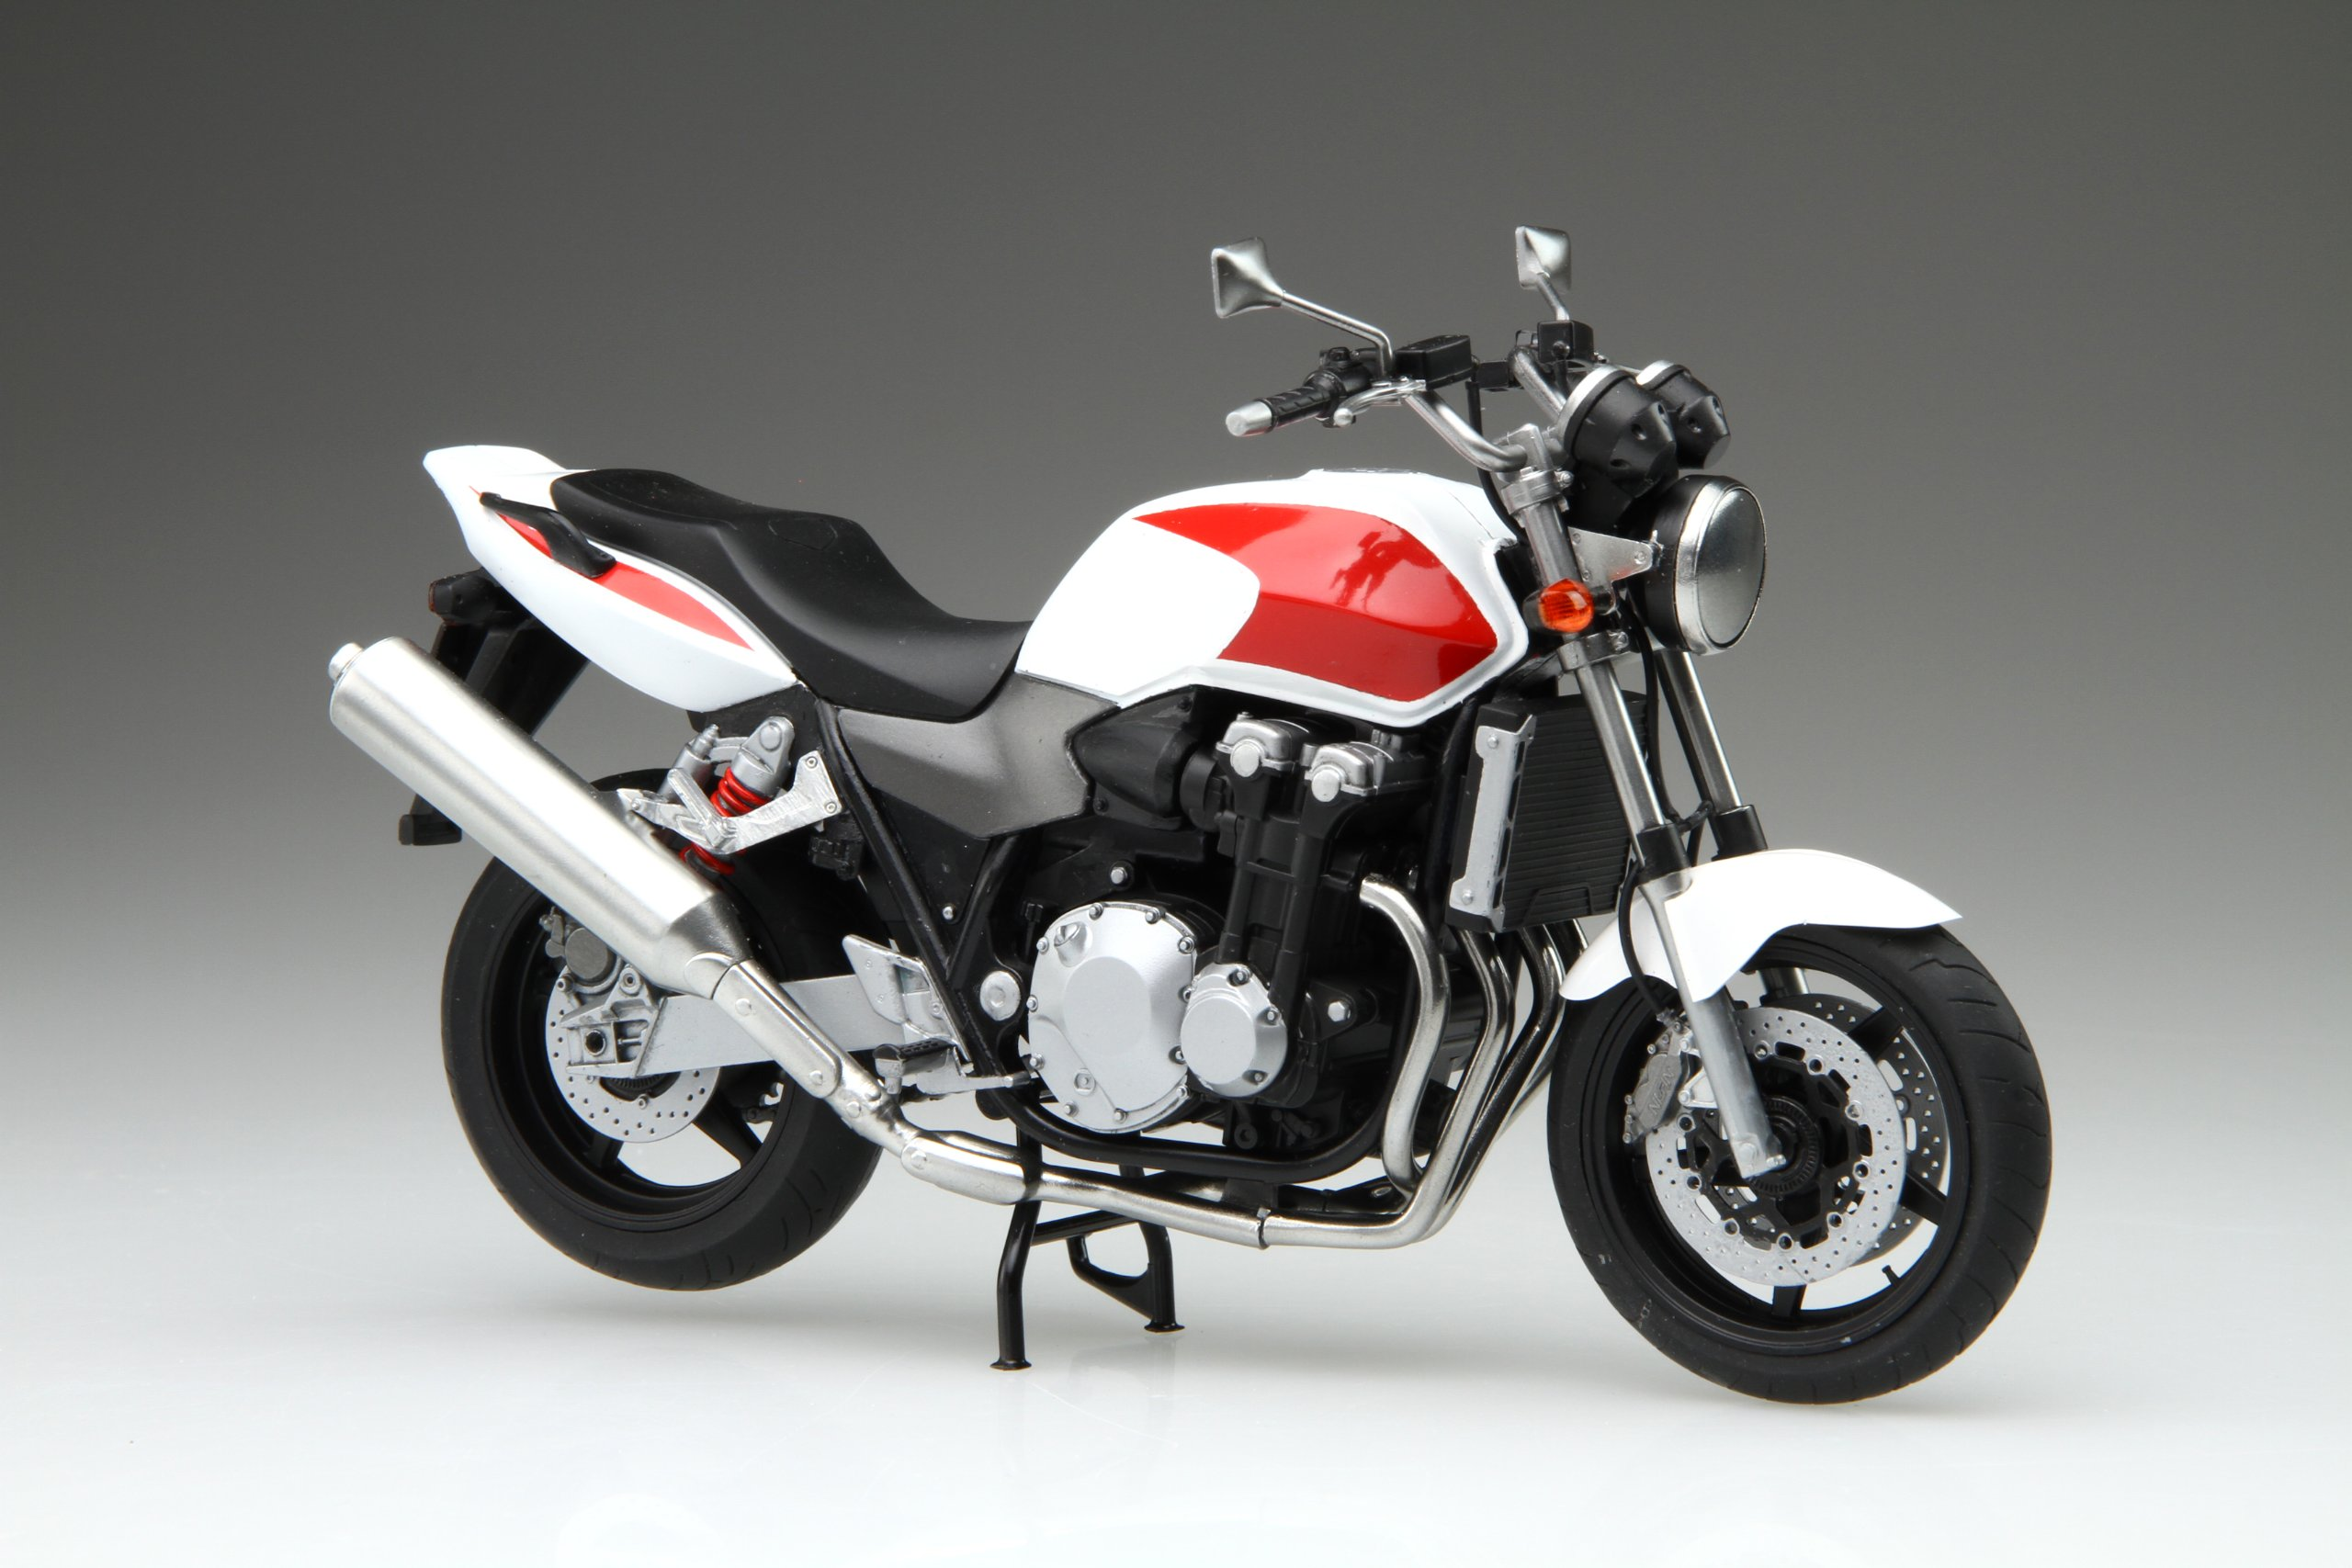 Купить мотоцикл Honda - baltmoto.ru